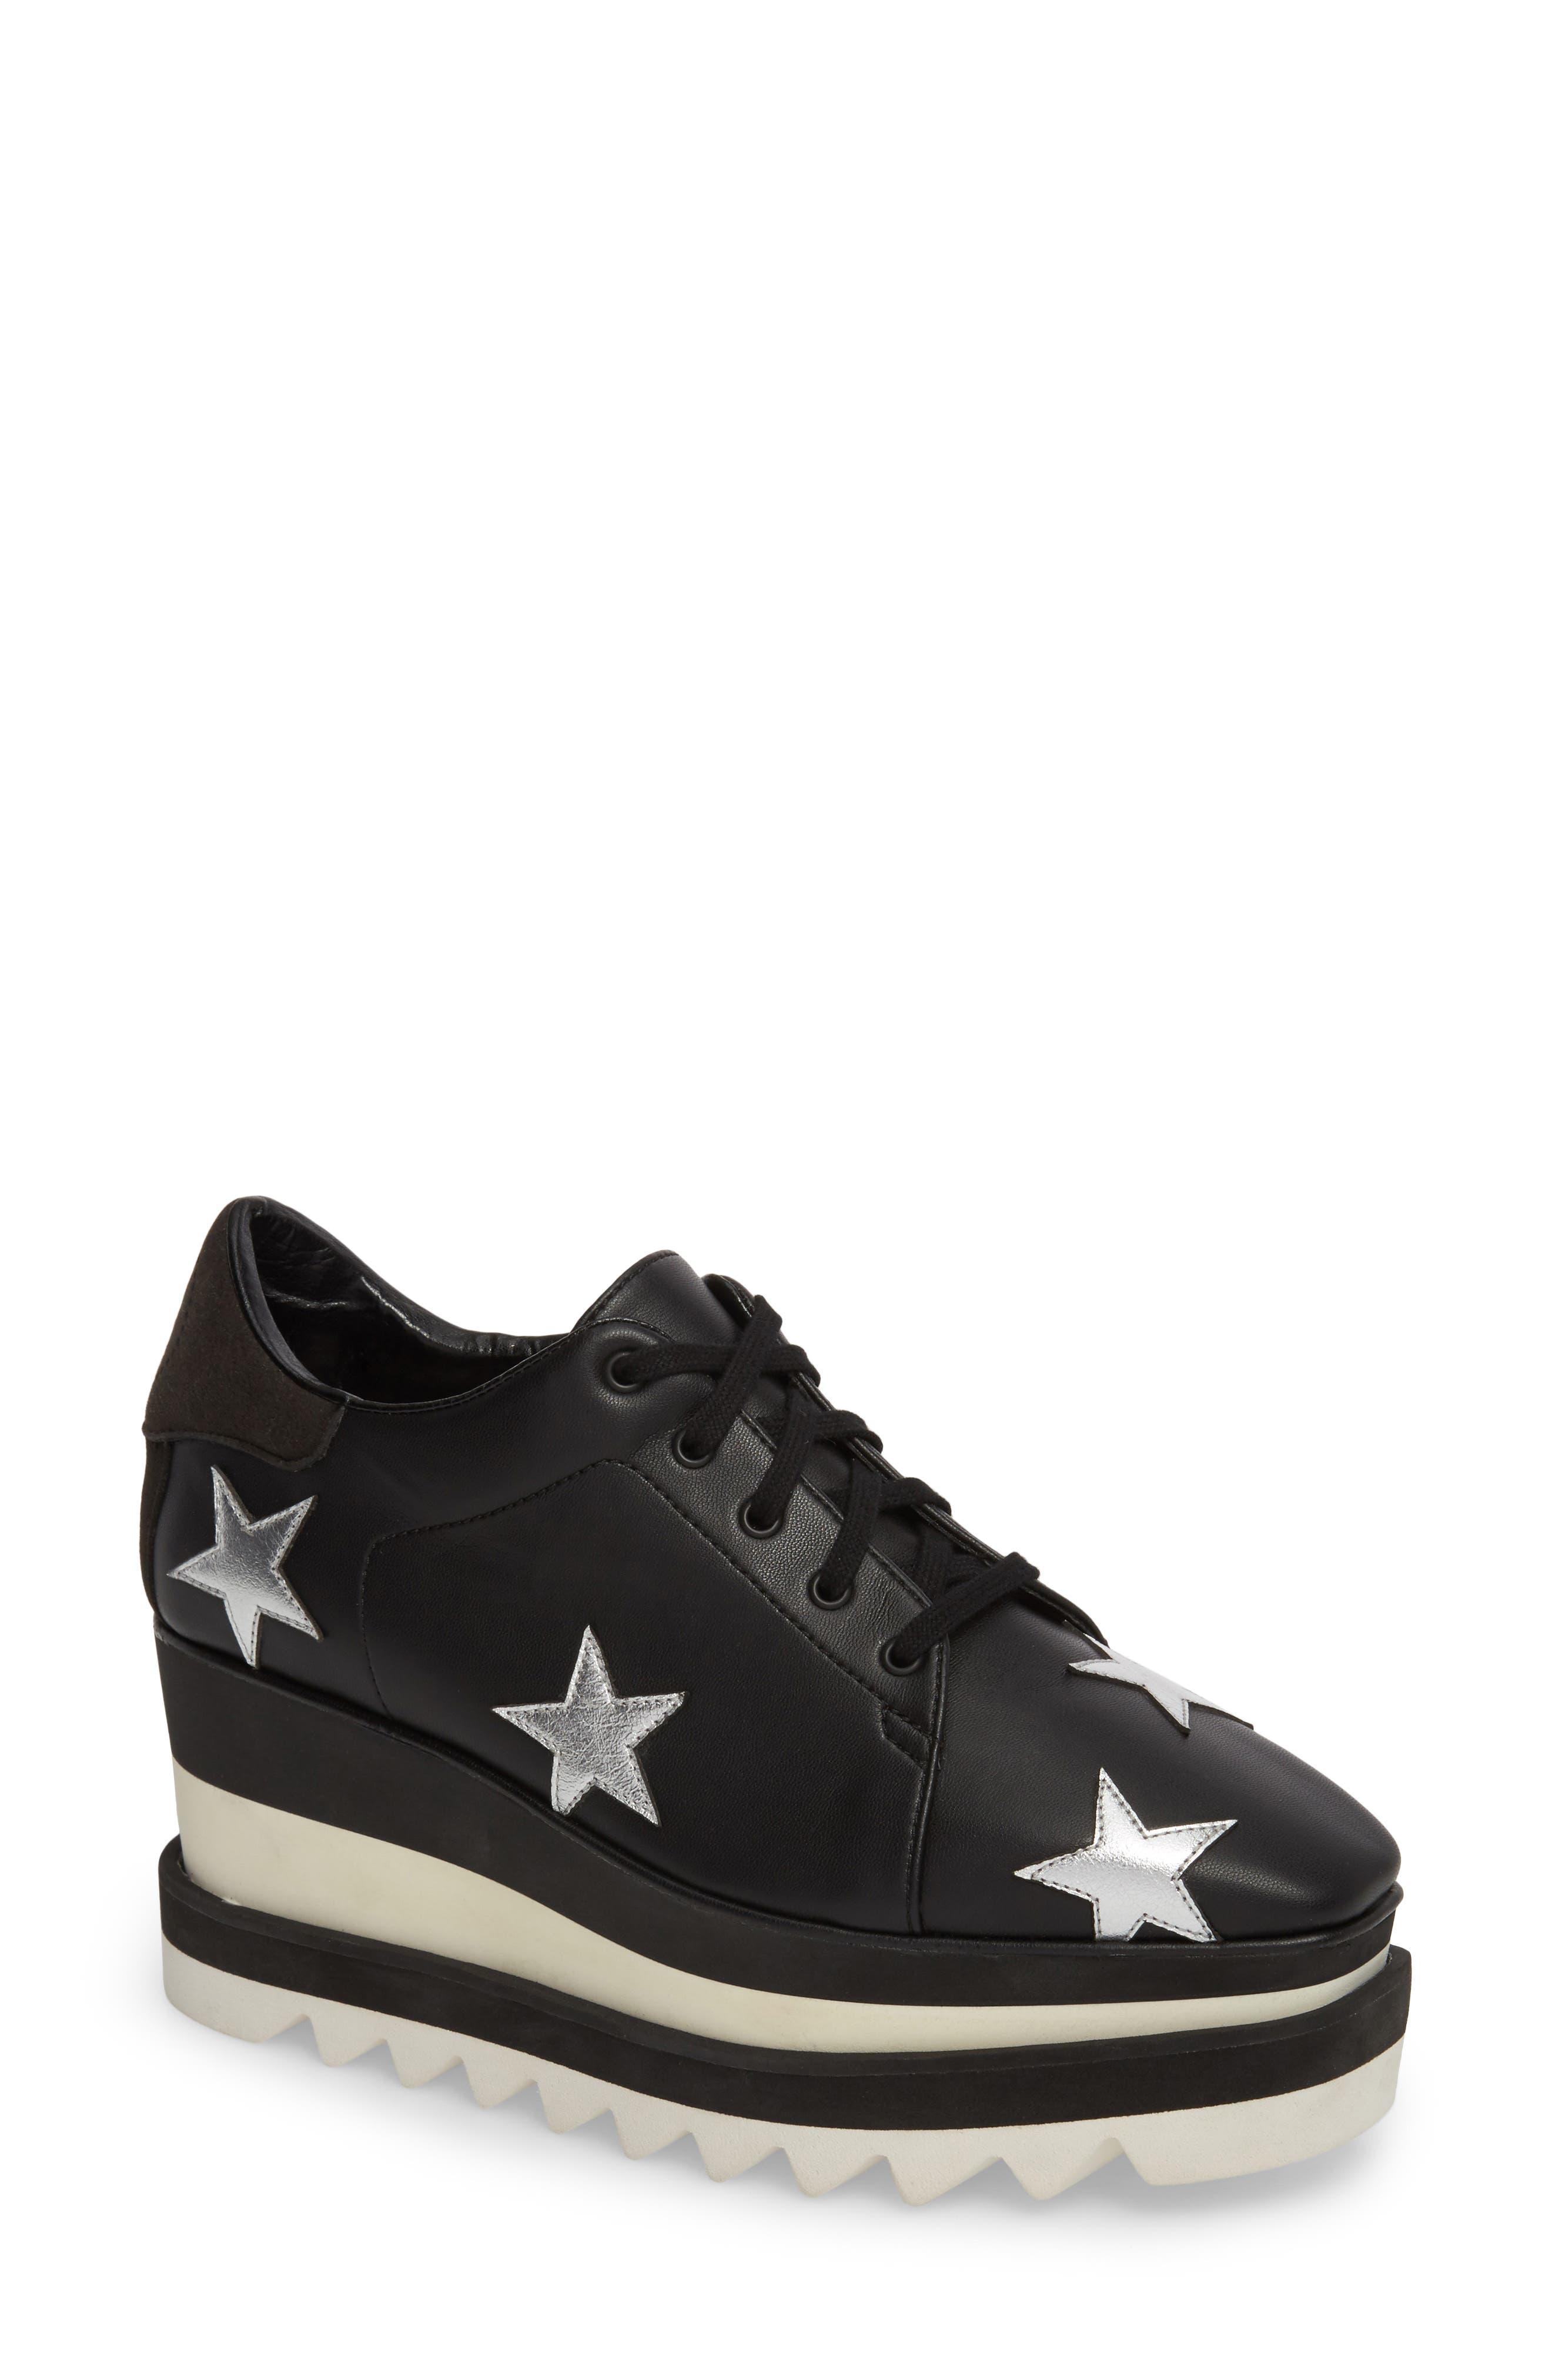 Elyse Platform Sneaker,                         Main,                         color, BLACK